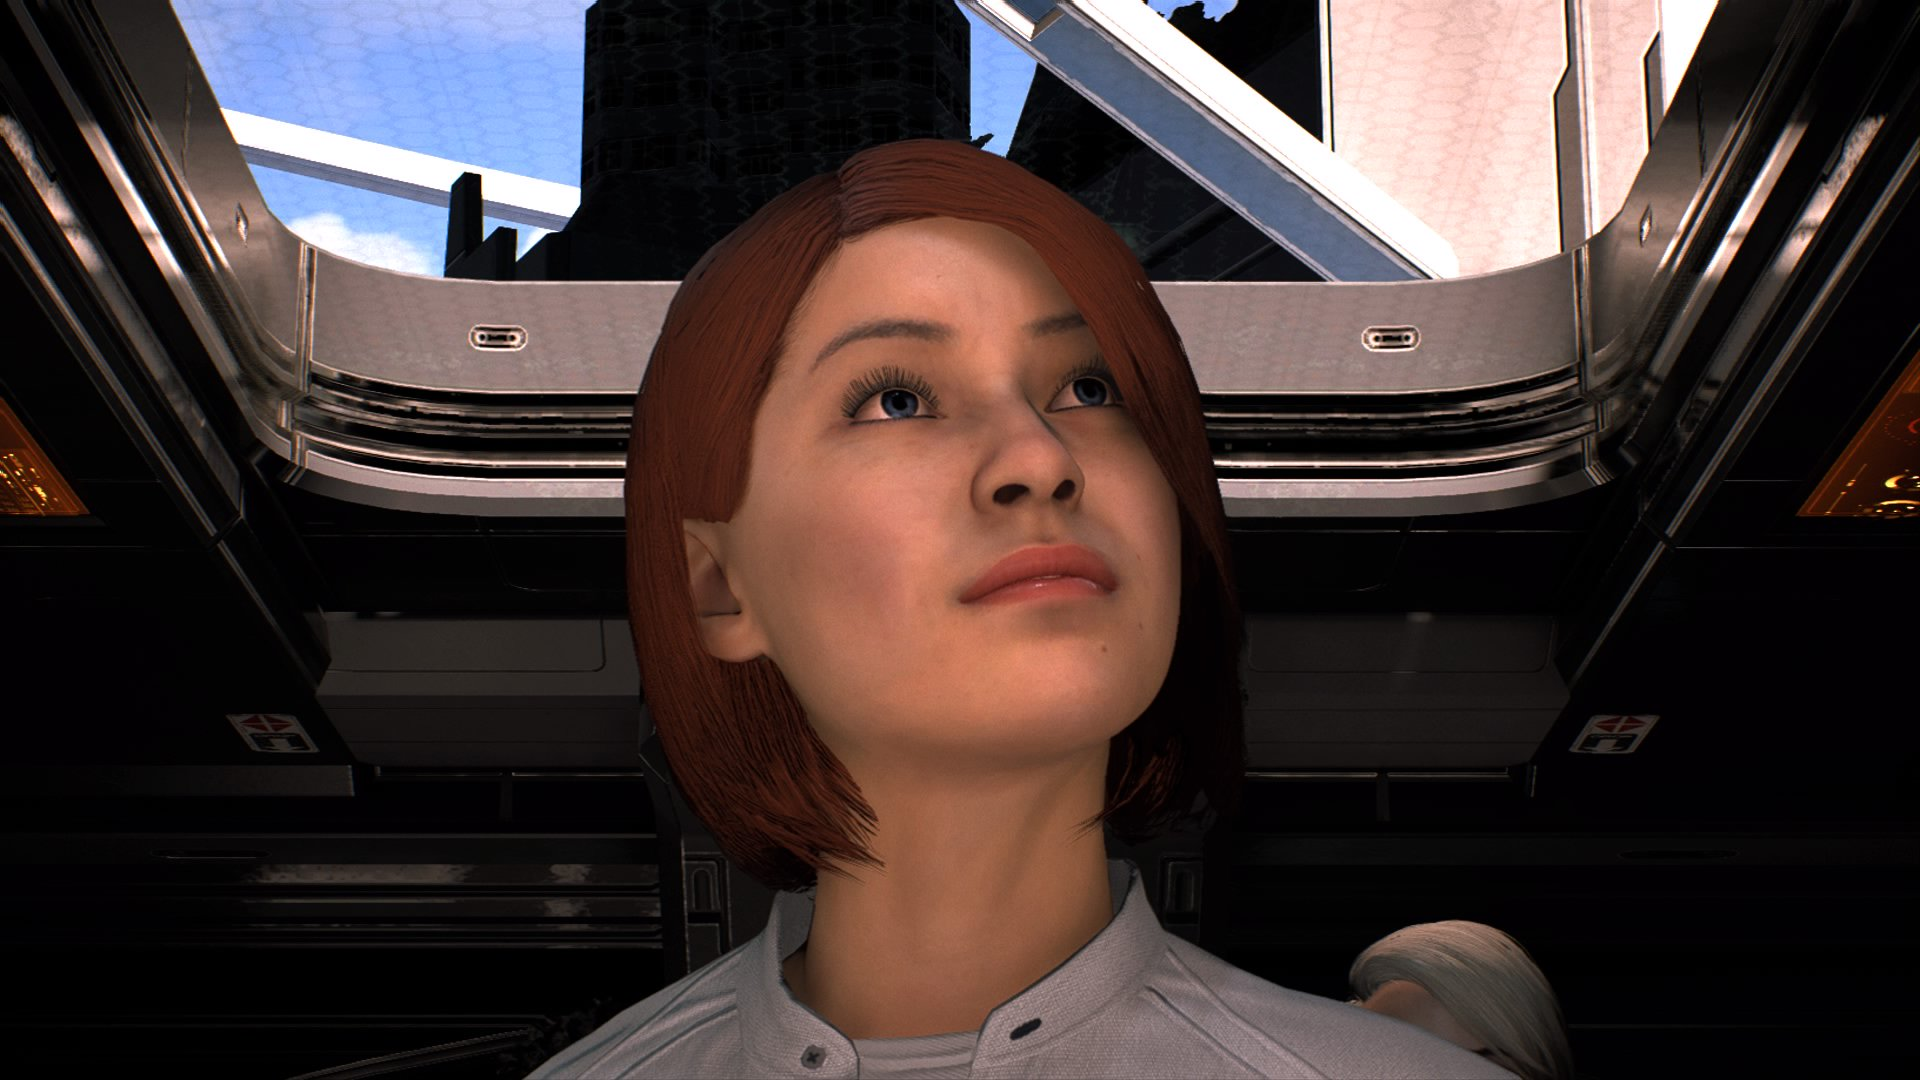 Сара Райдер - Mass Effect: Andromeda Персонаж